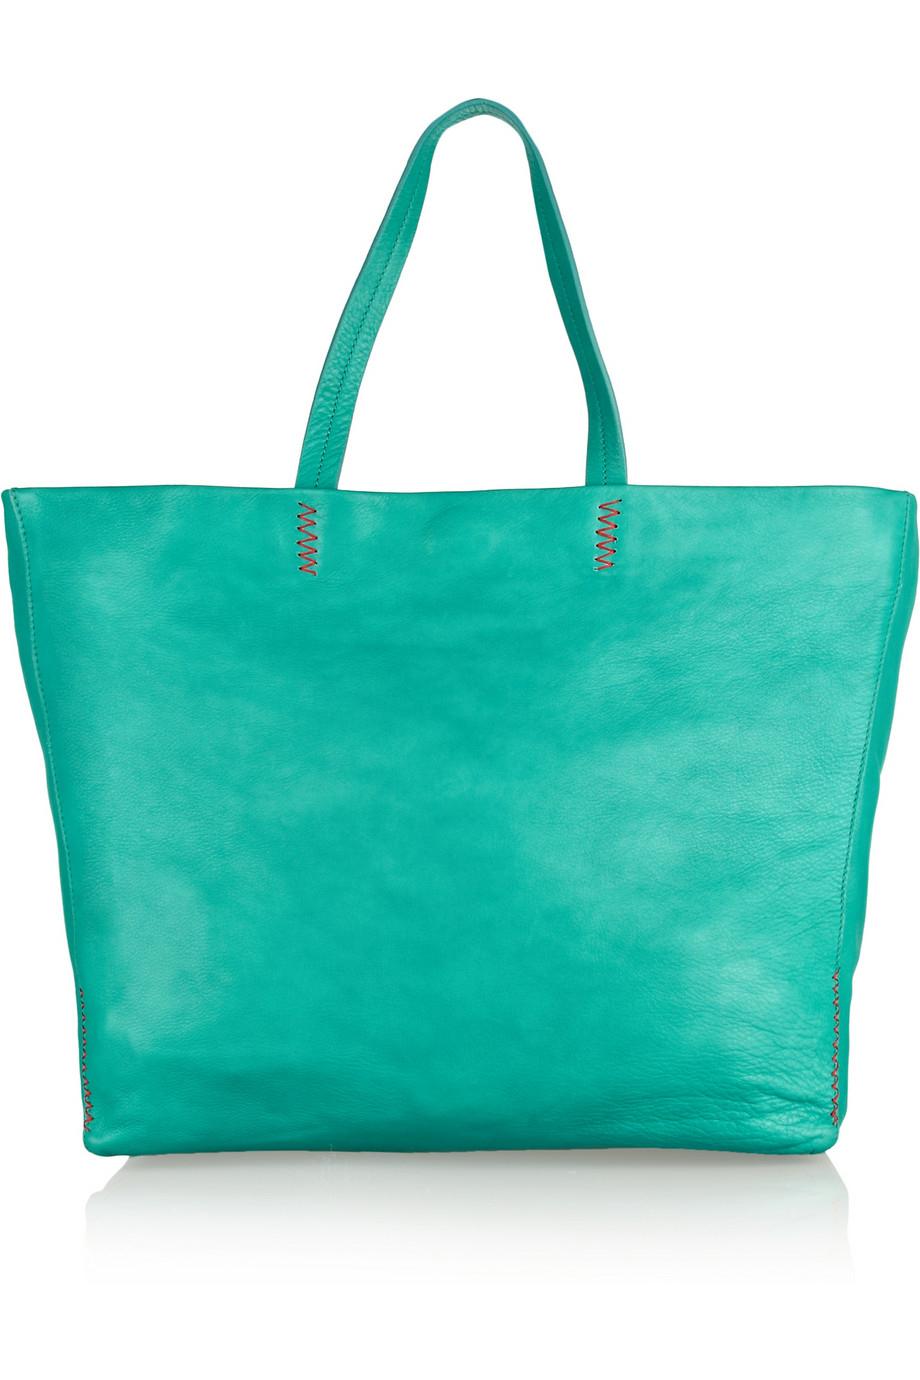 ce6f37f182 M Missoni Leather Shopper in Green - Lyst